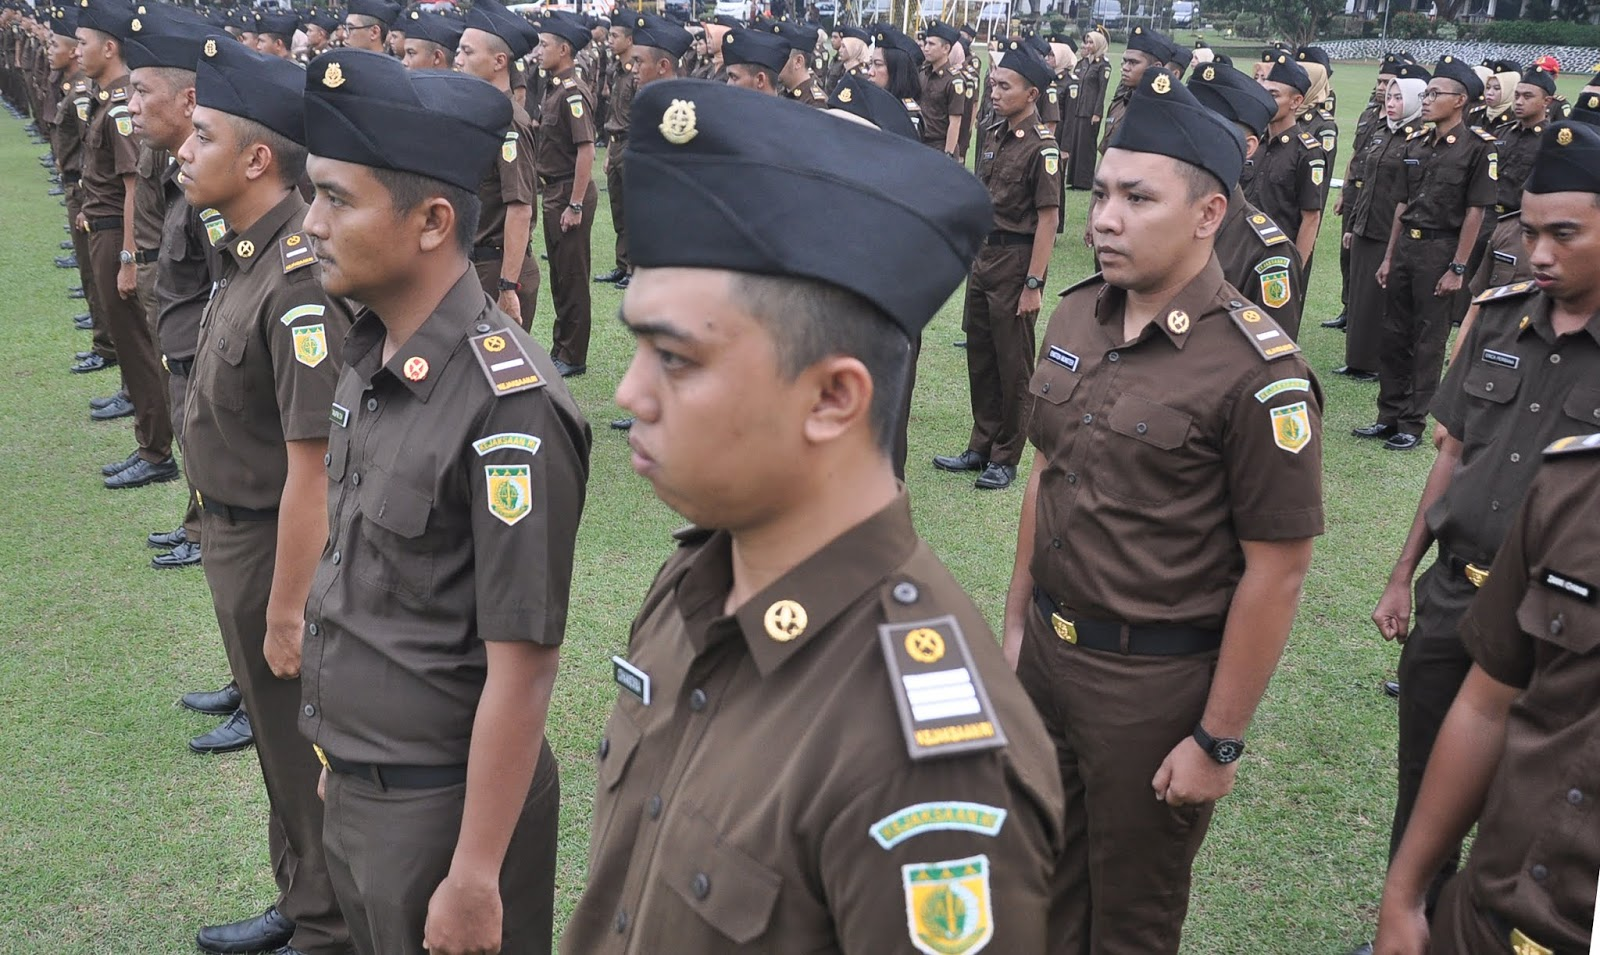 Badiklat Kejaksaan Cetak 882 Adhyaksa Muda Adhyaksa Foto Indonesia